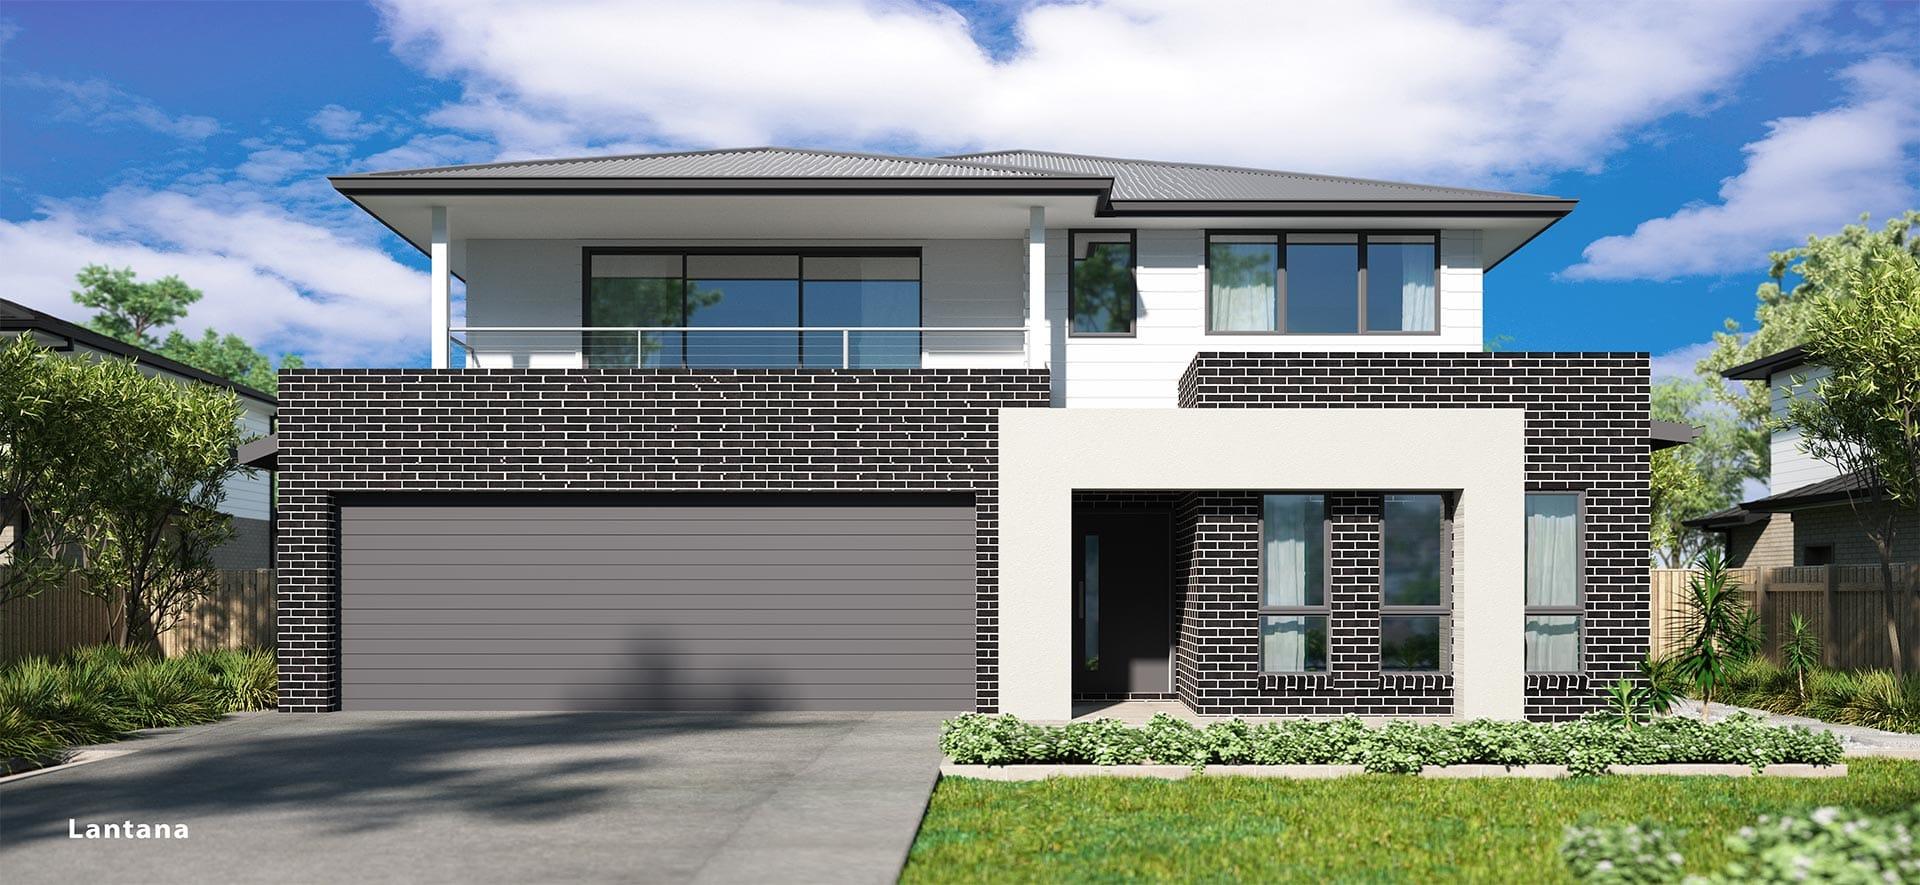 Lantana Double House Design